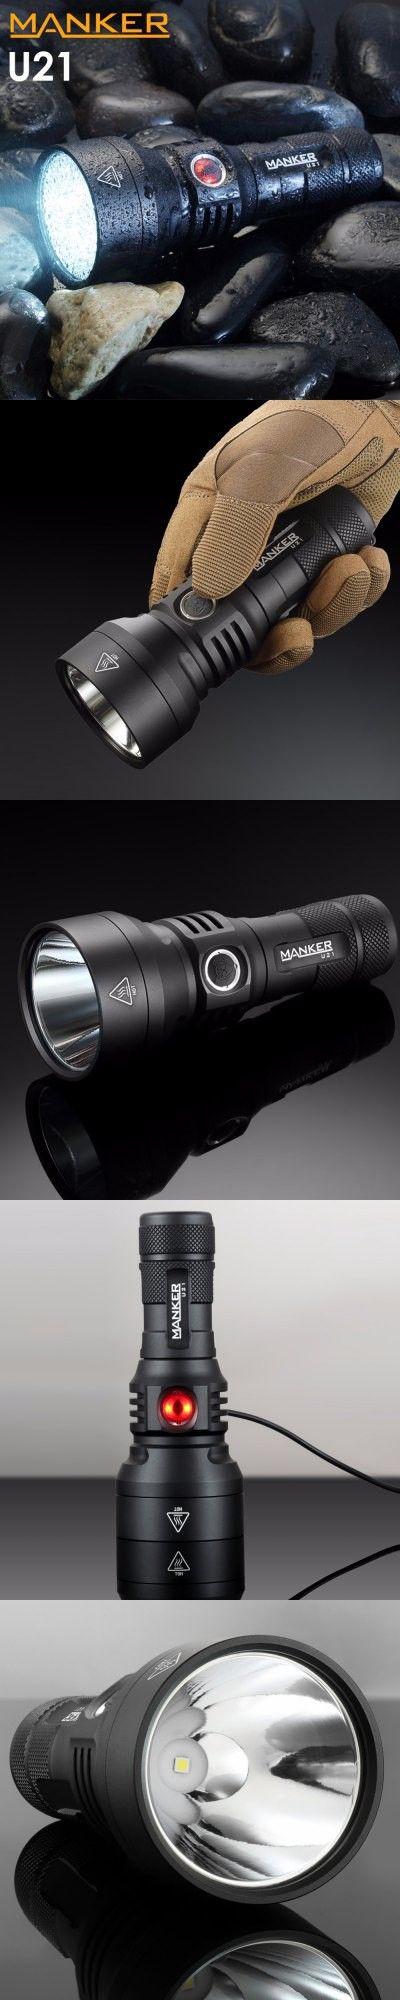 Manker U21 LED Flashlight